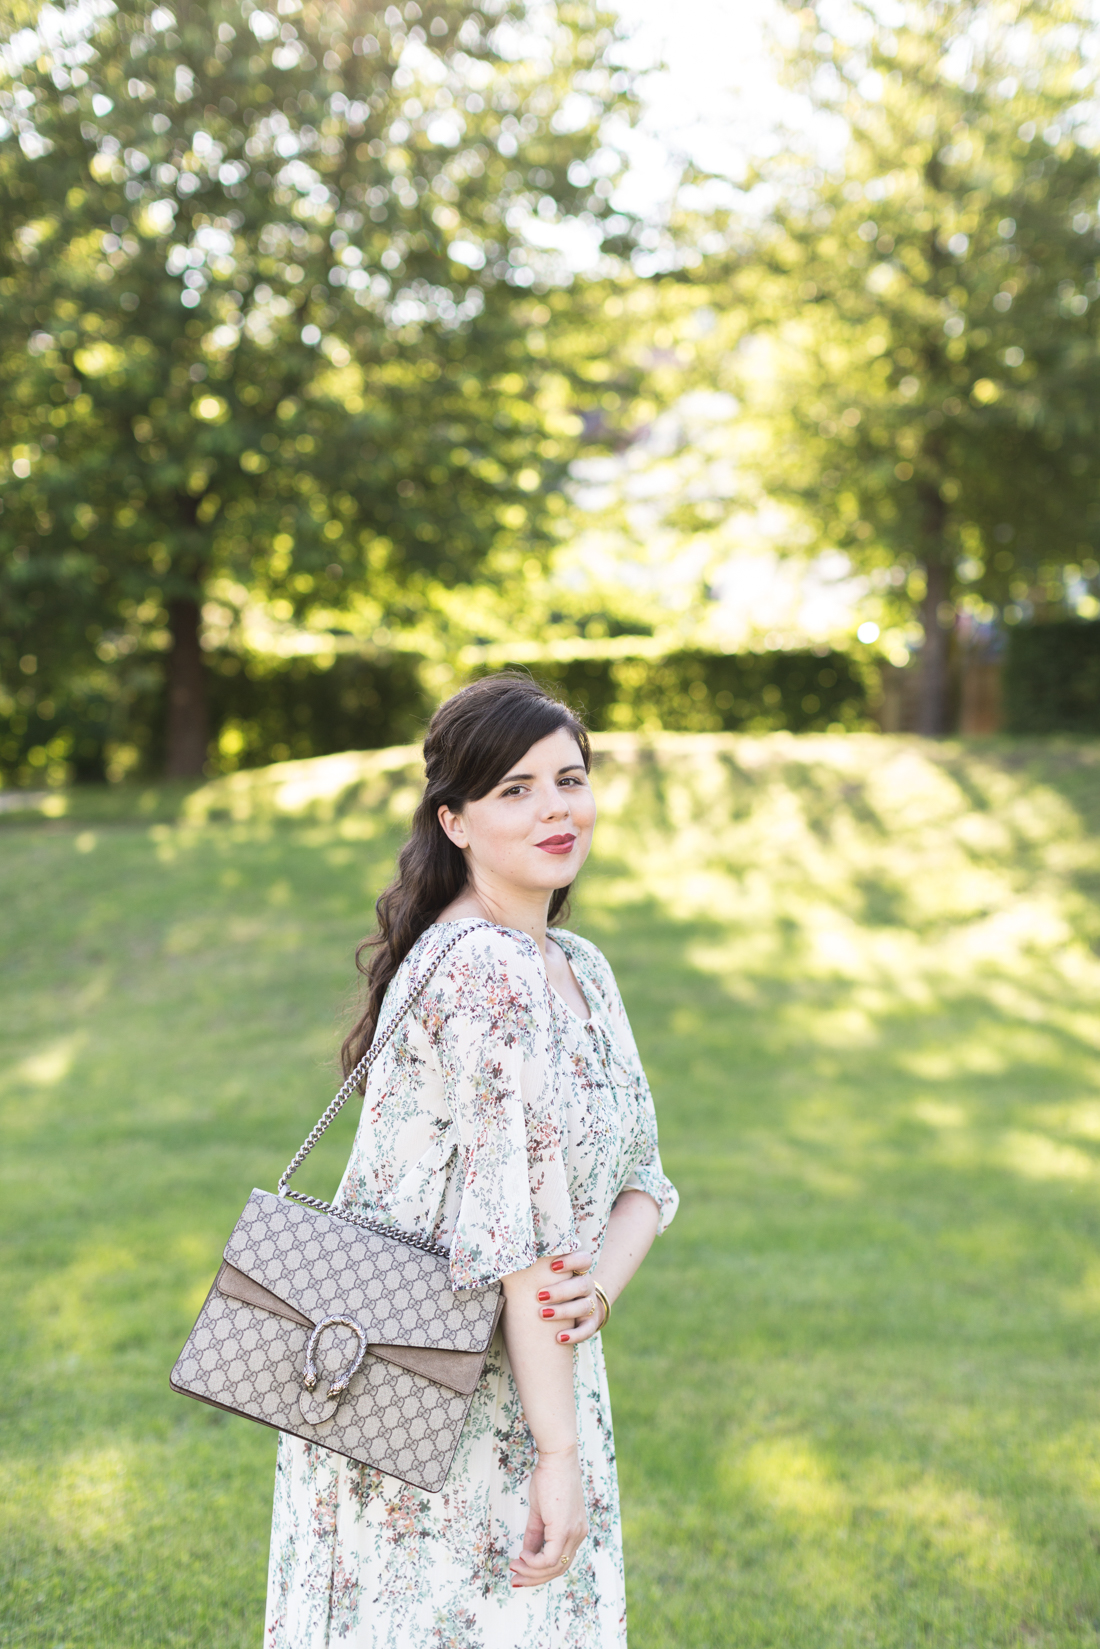 1100 robe ikks sac gucci dionysus espadrilles sezane - copyright Pauline paulinefashionblog.com-6